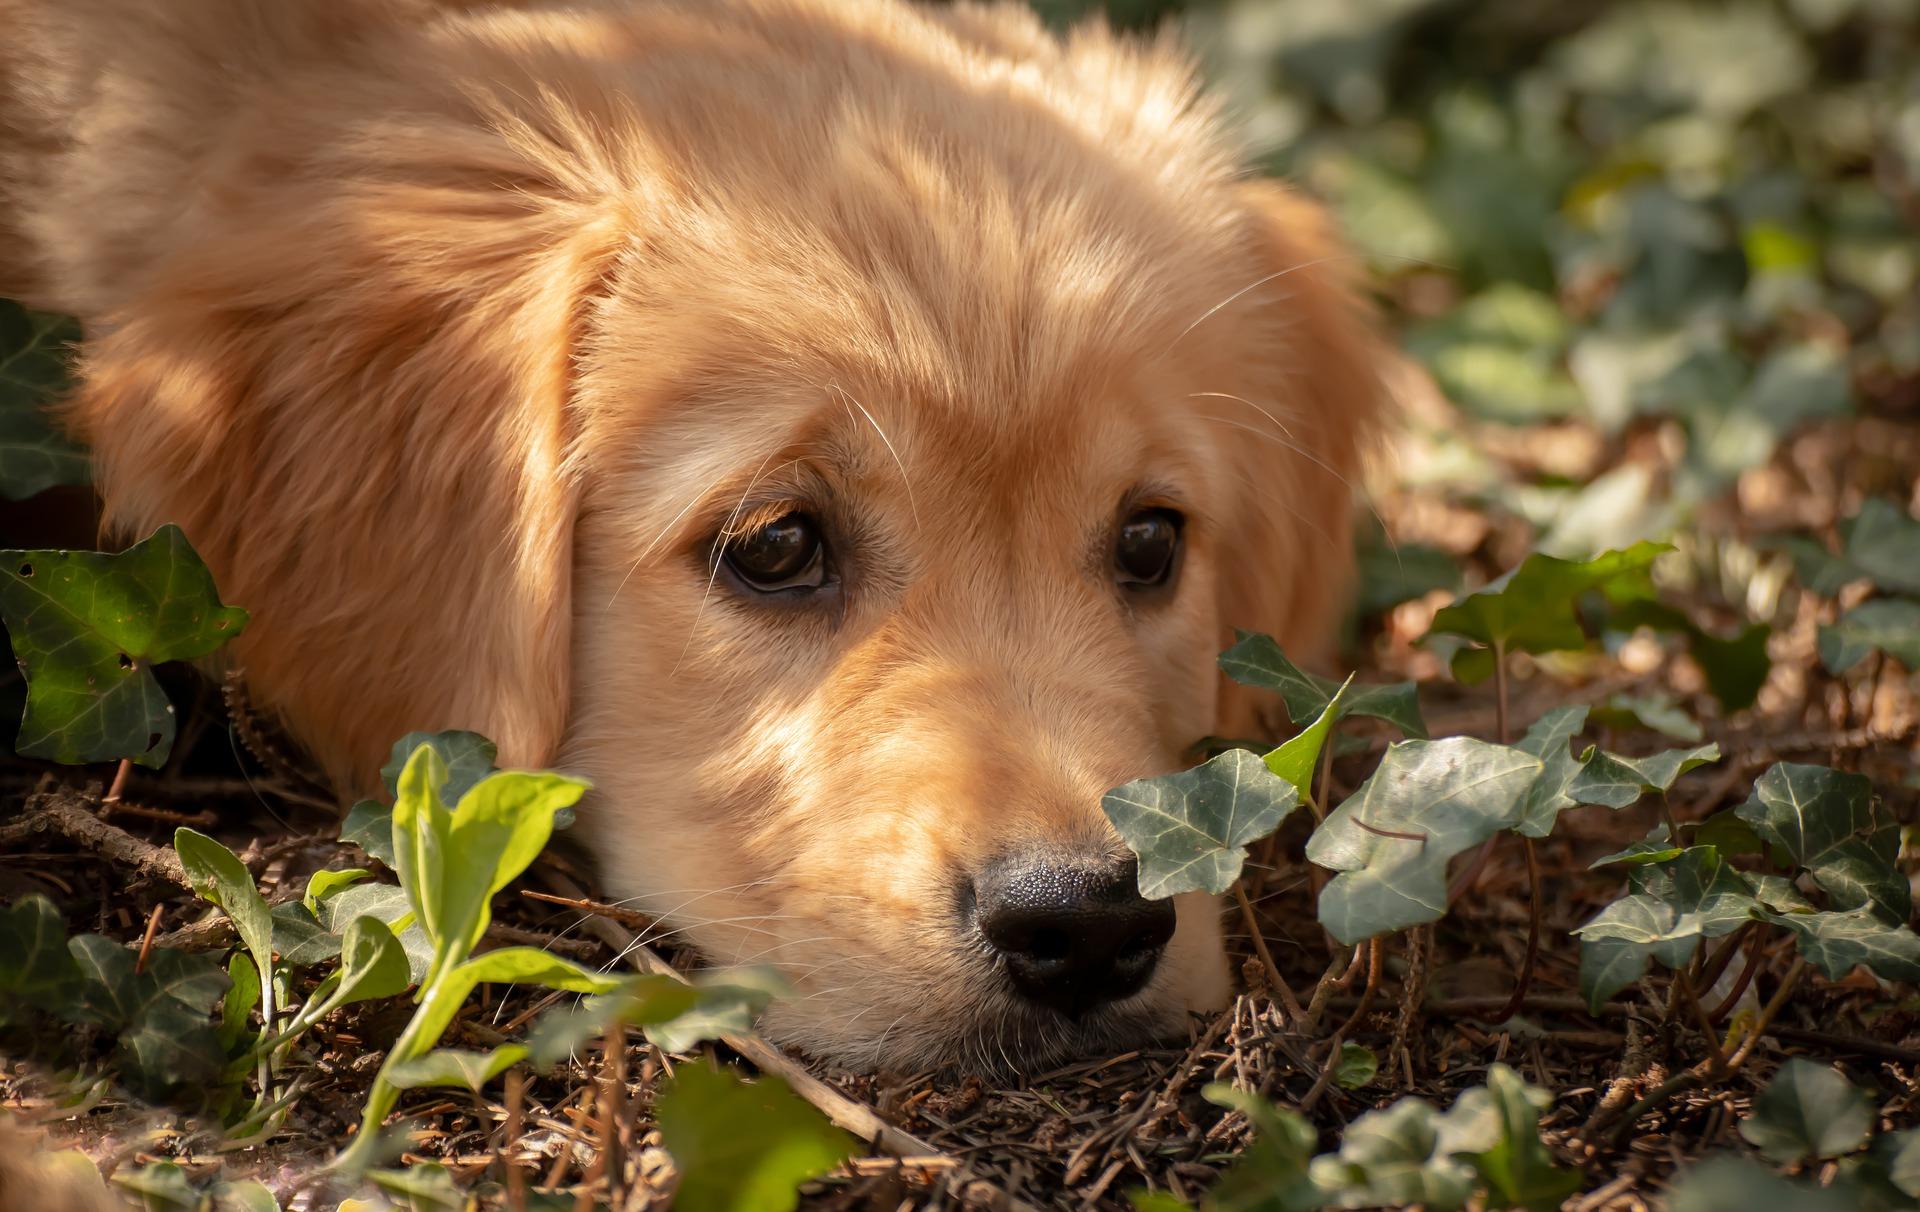 perro olfateando